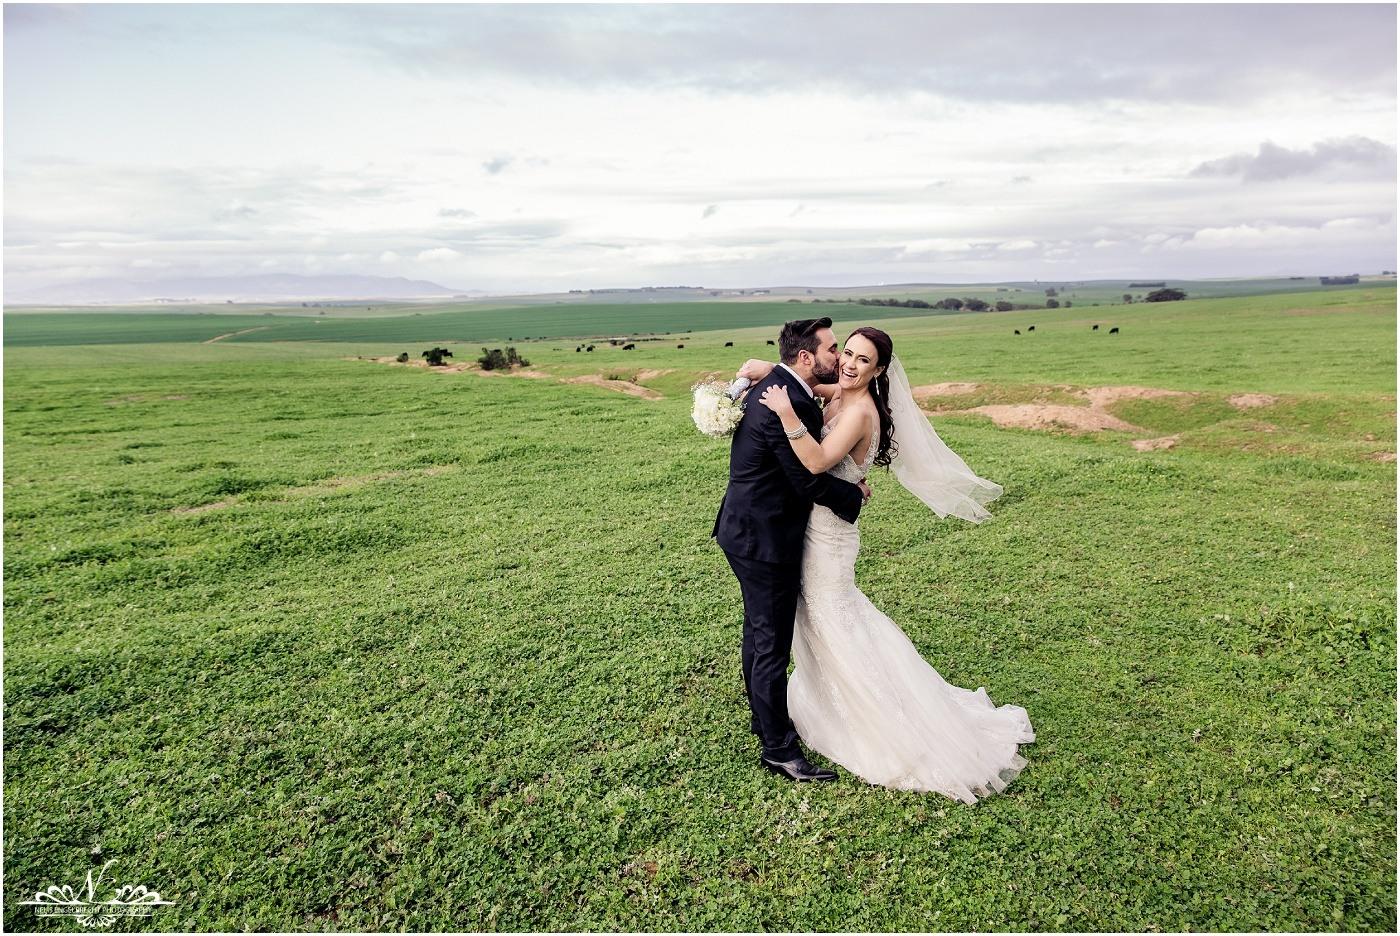 Eensgezind-Wedding-Photos-Nelis-Engelbrecht-Photography-093